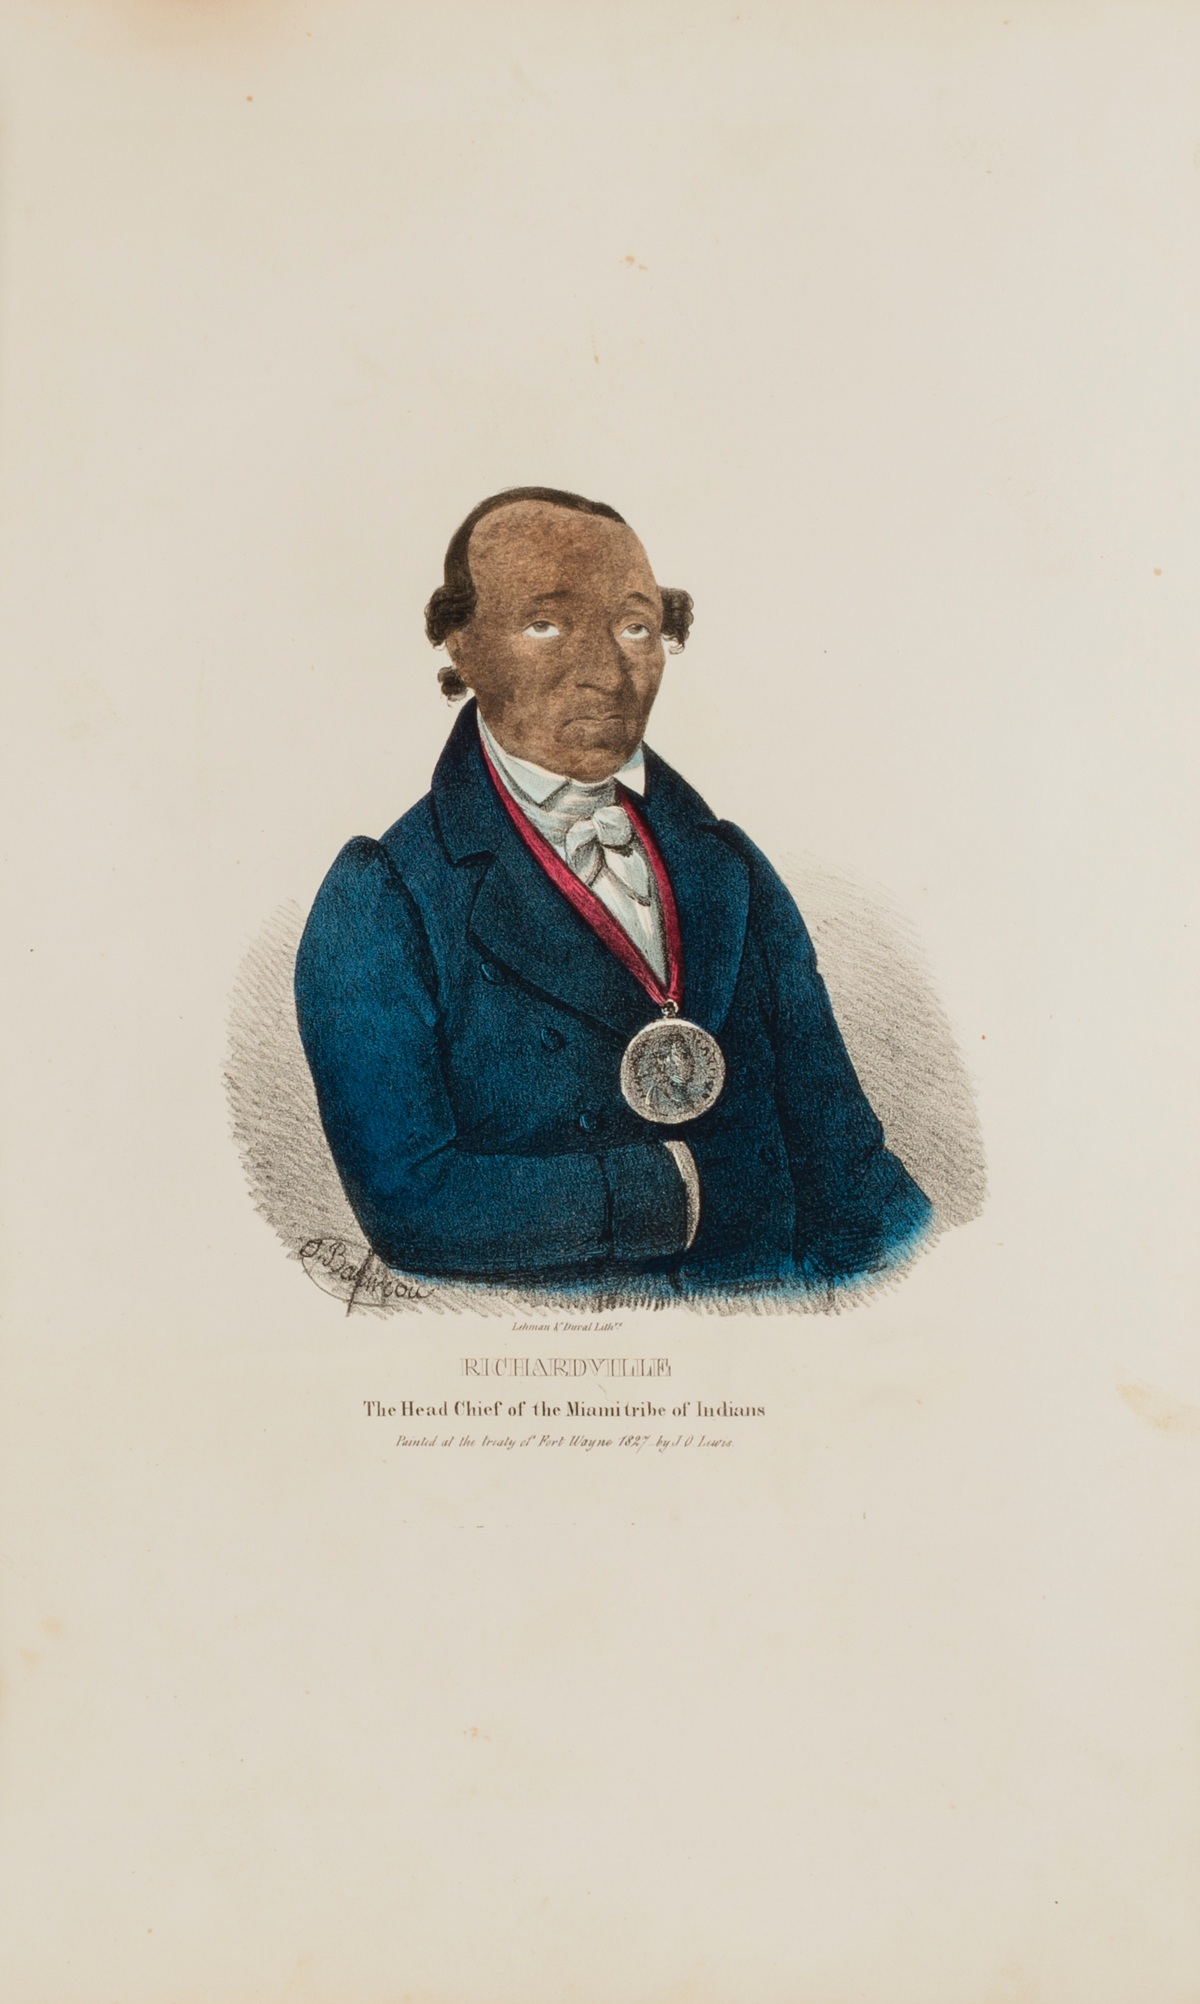 A portrait of J.B. Richardville by J.O. Lewis